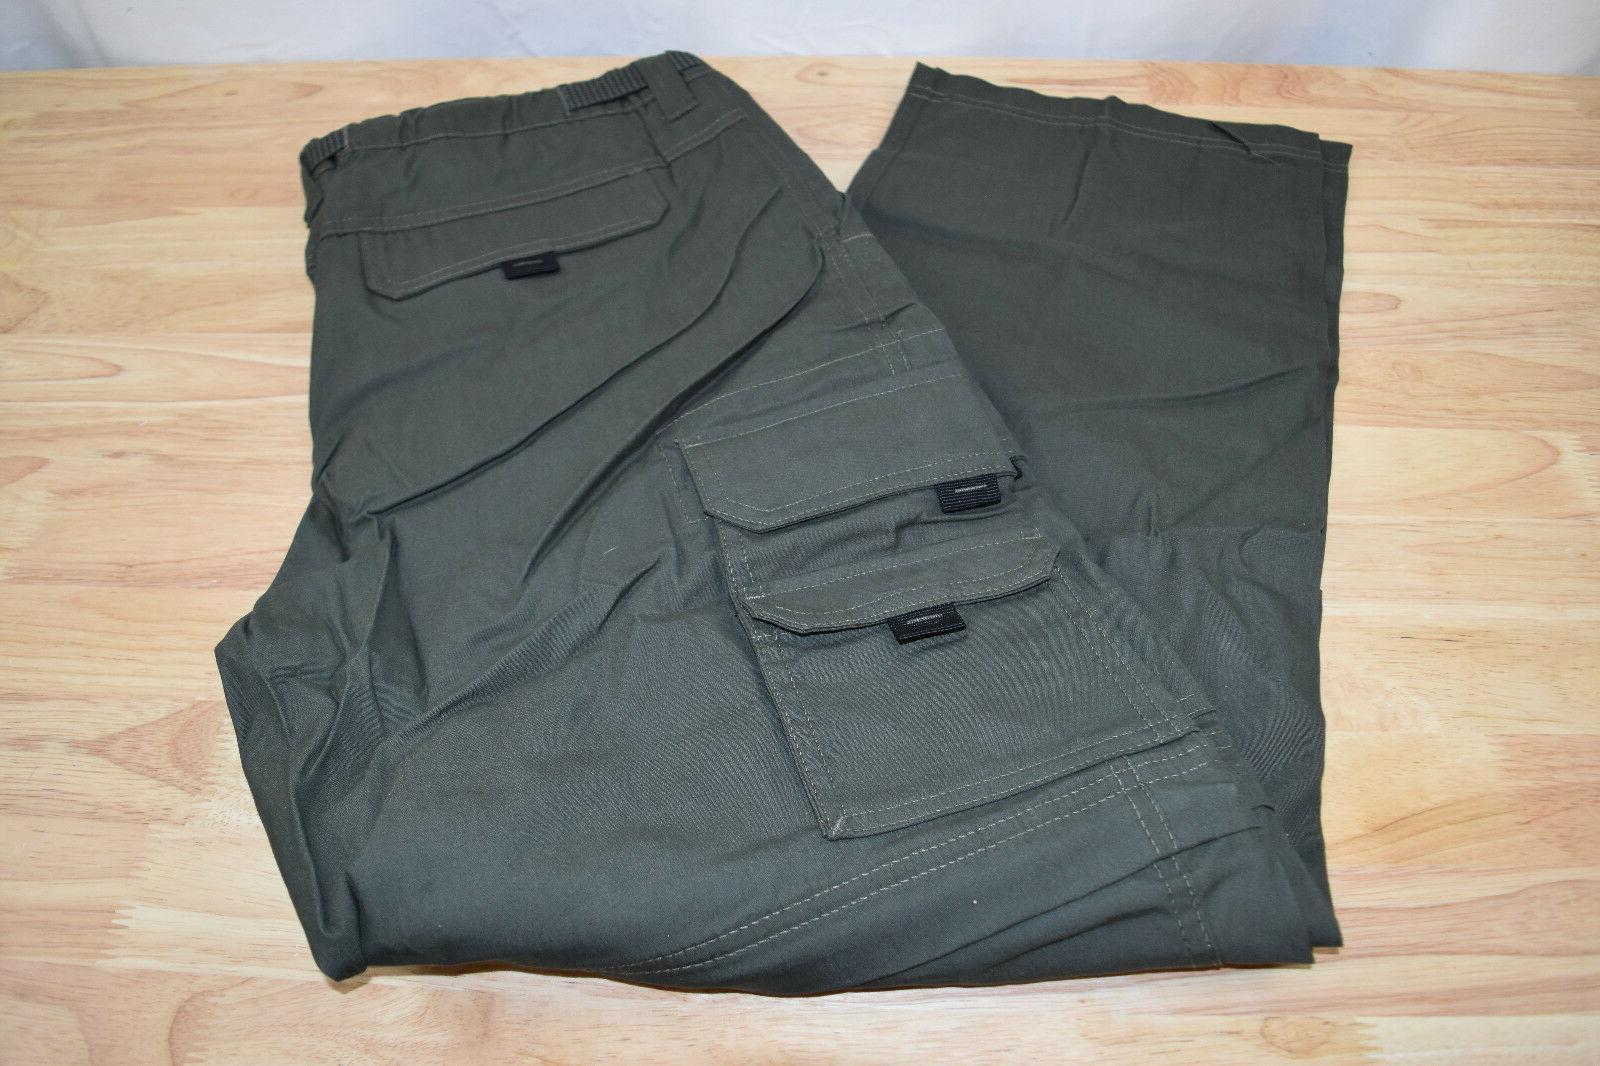 NWT Clothing Convertible Hiking Shorts Stretch VARIETY!